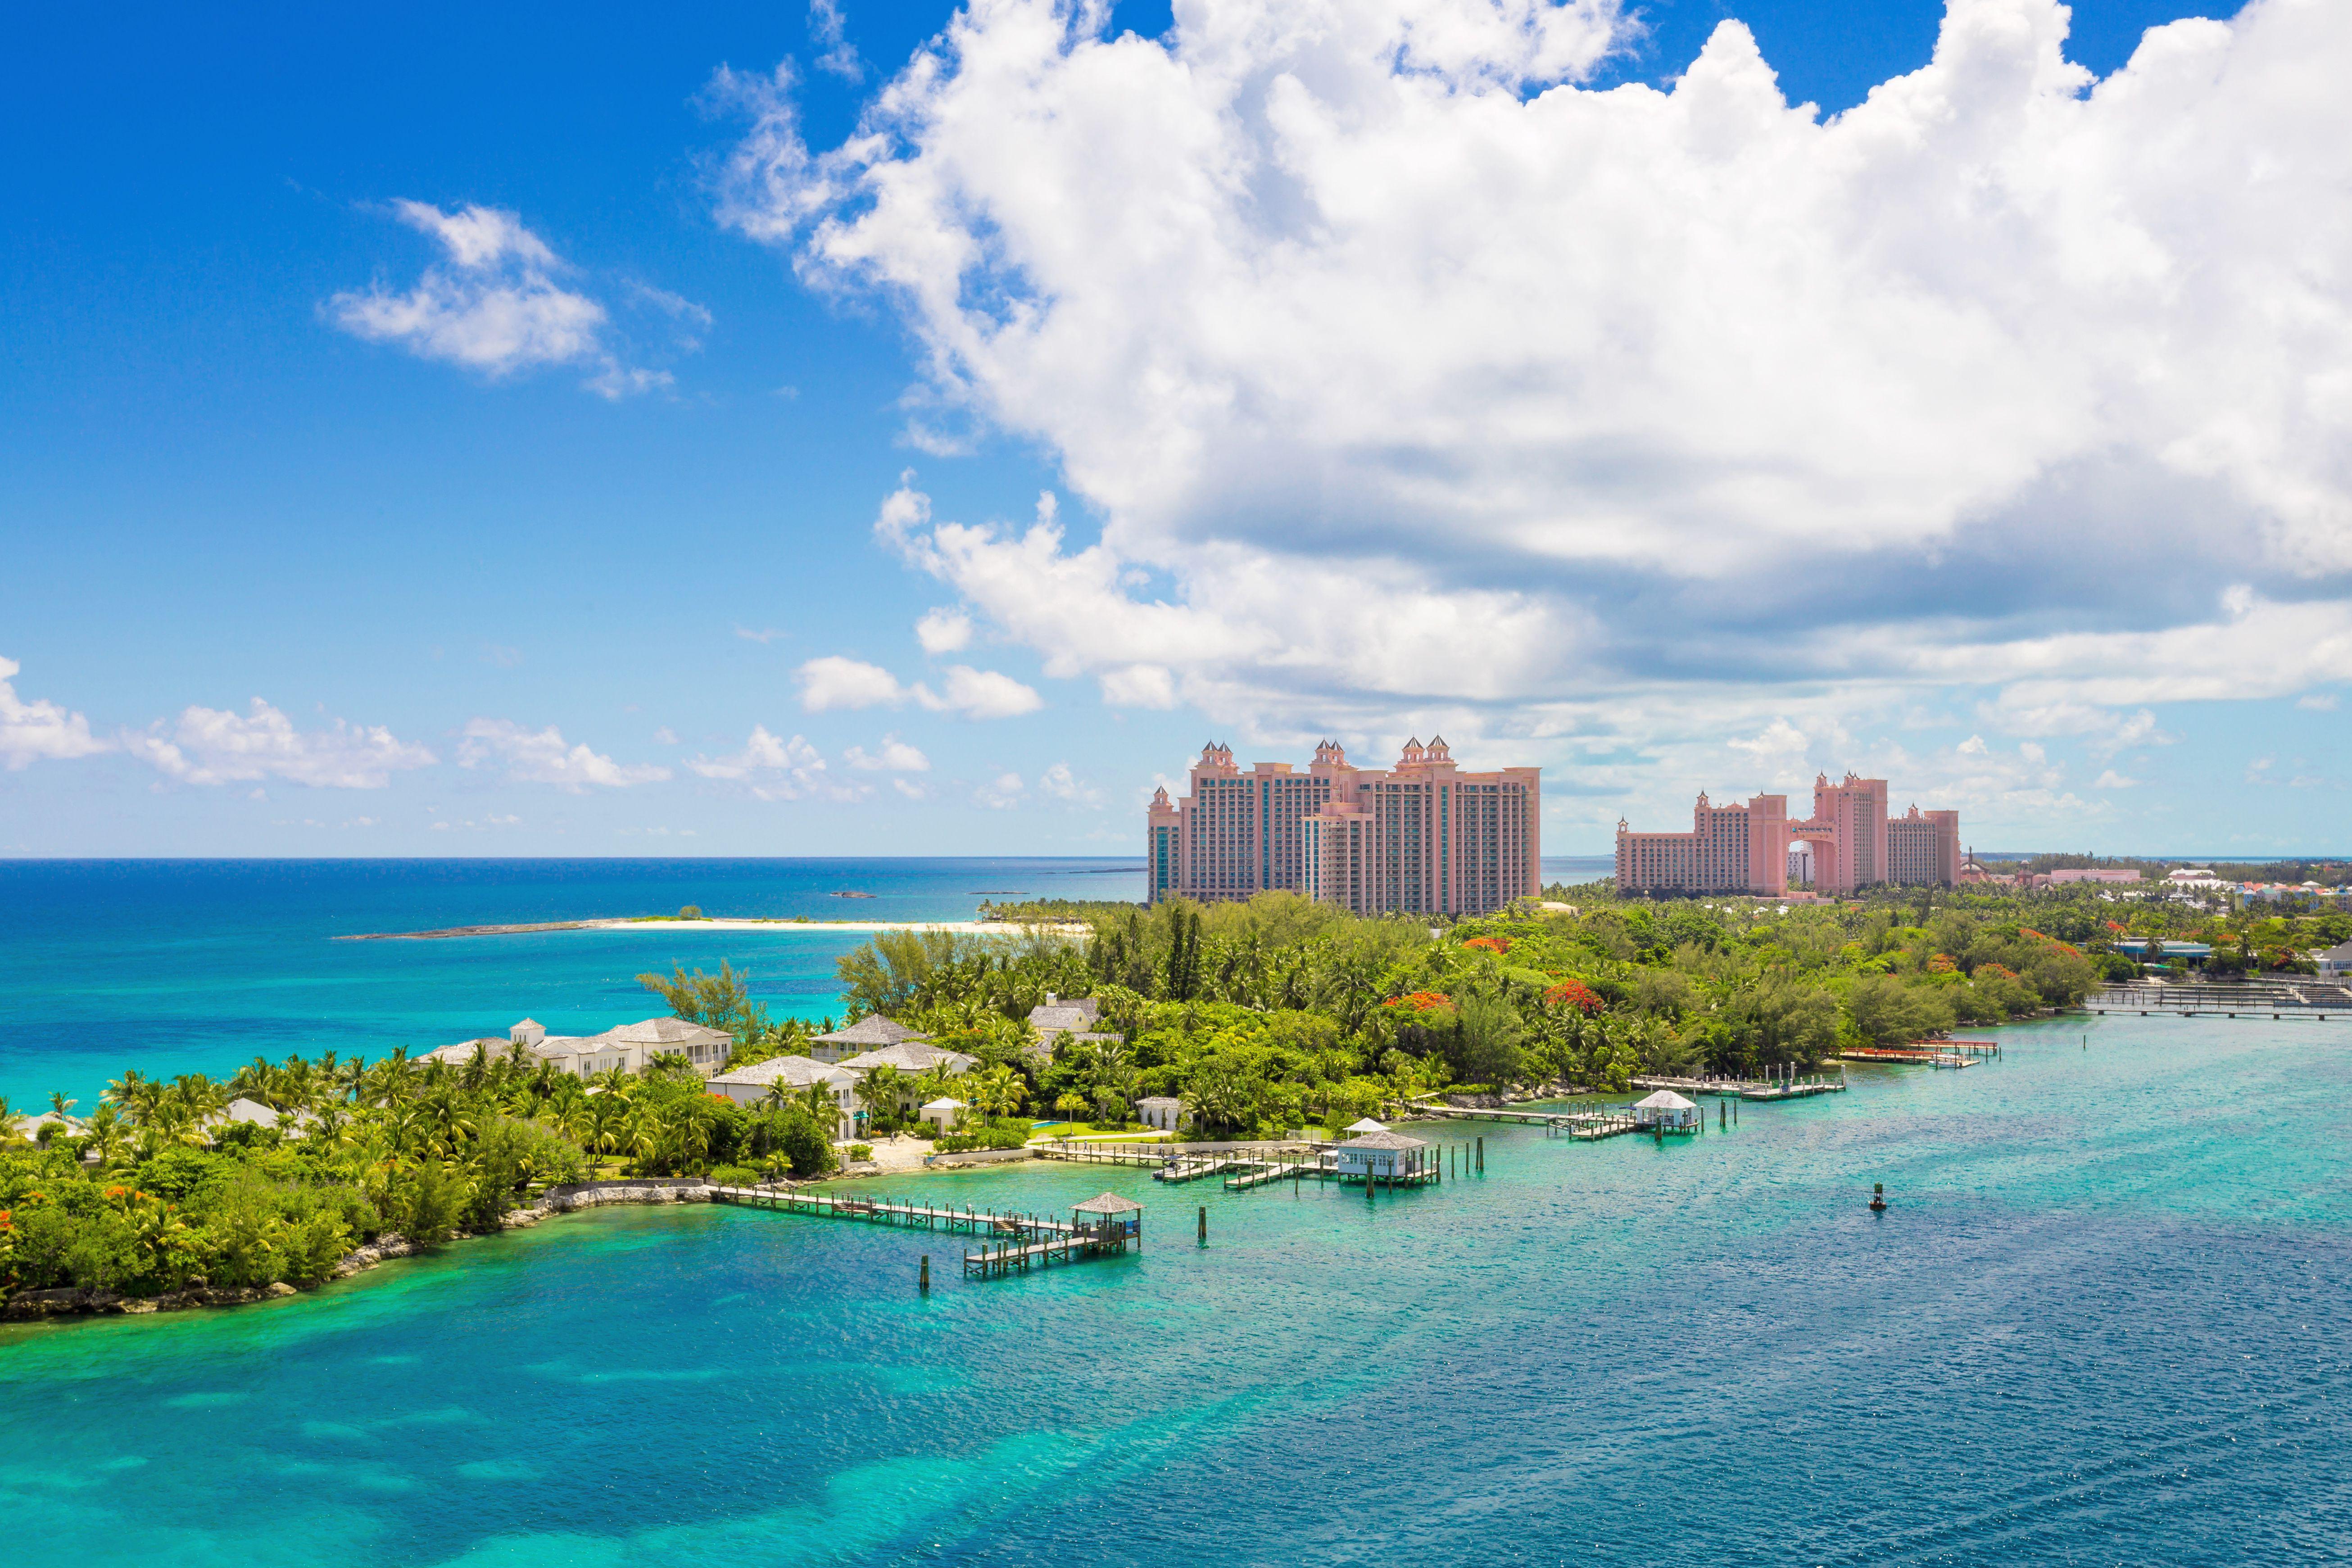 Bahamas tropical beach scenery at Nassau, caribbean